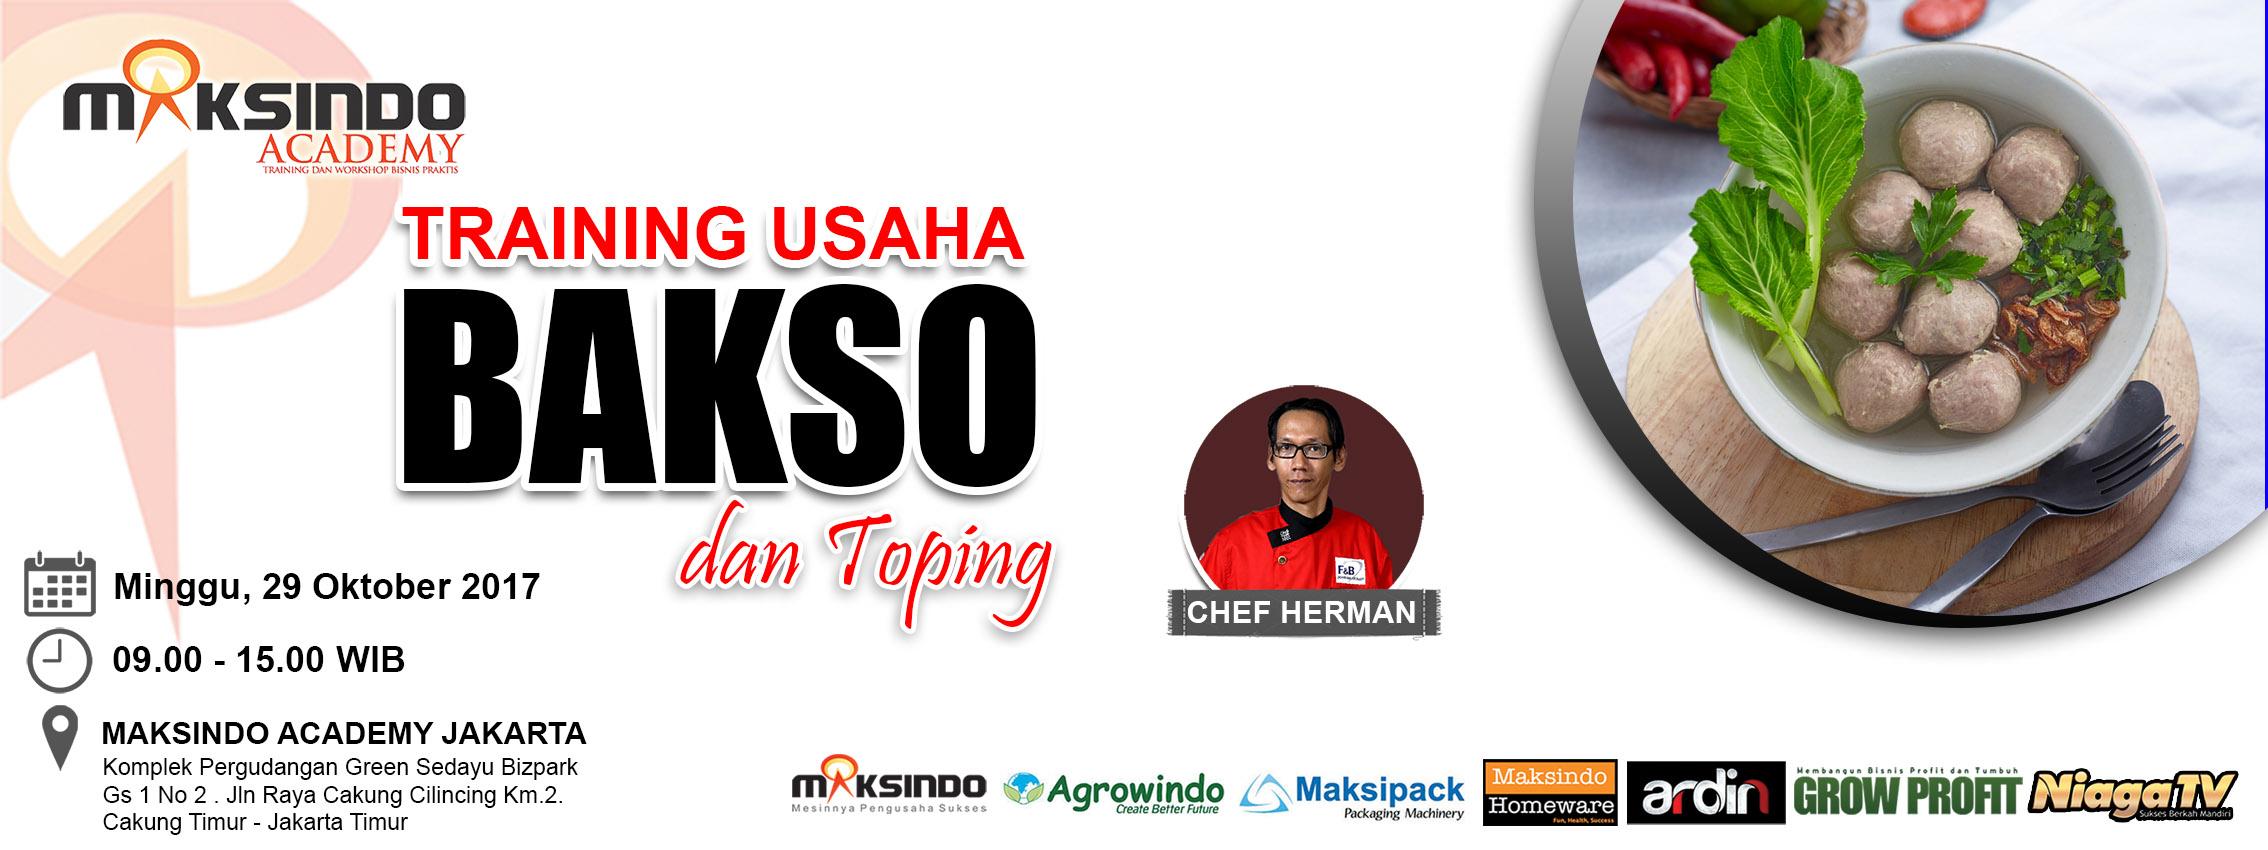 Toko Mesin Maksindo BSD Tangerang 1